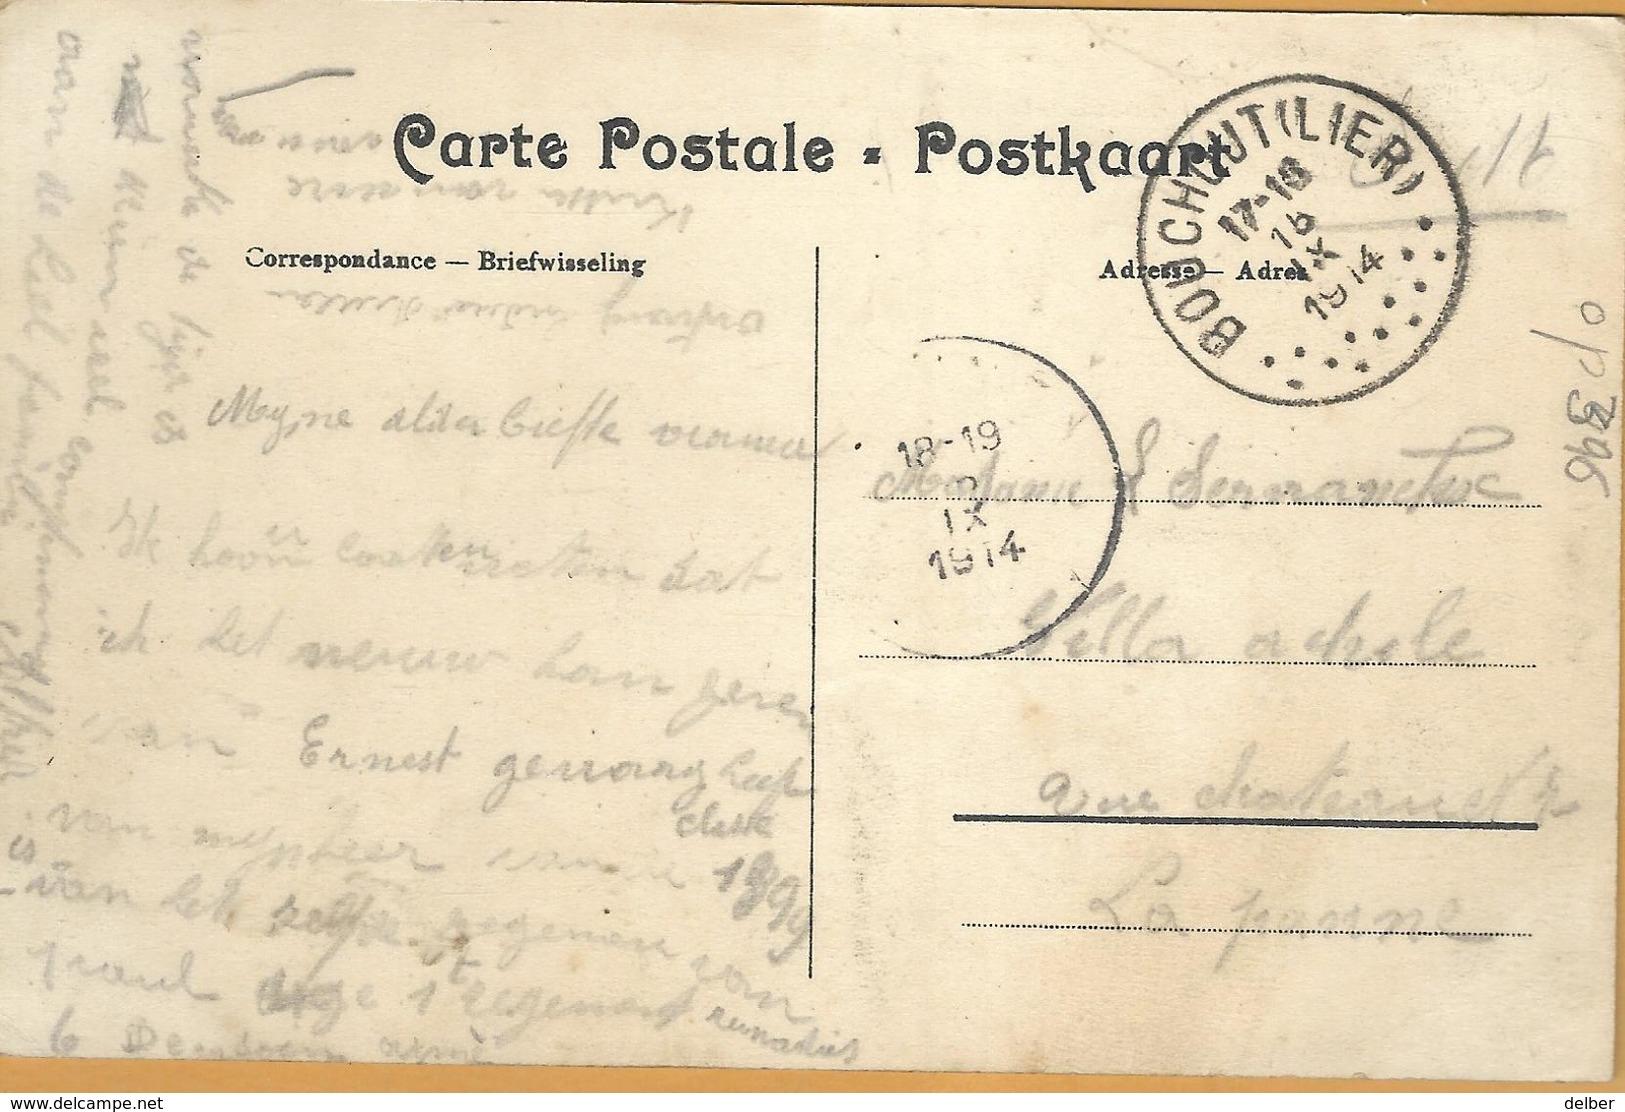 Op-396: S.M. BOUCHOUTE(LIER) 15 IX 1914 > PANNE 5 IX 1914 : Pk: Bouchout -Buitengoed E.SCHAEDELER - Oorlog 14-18